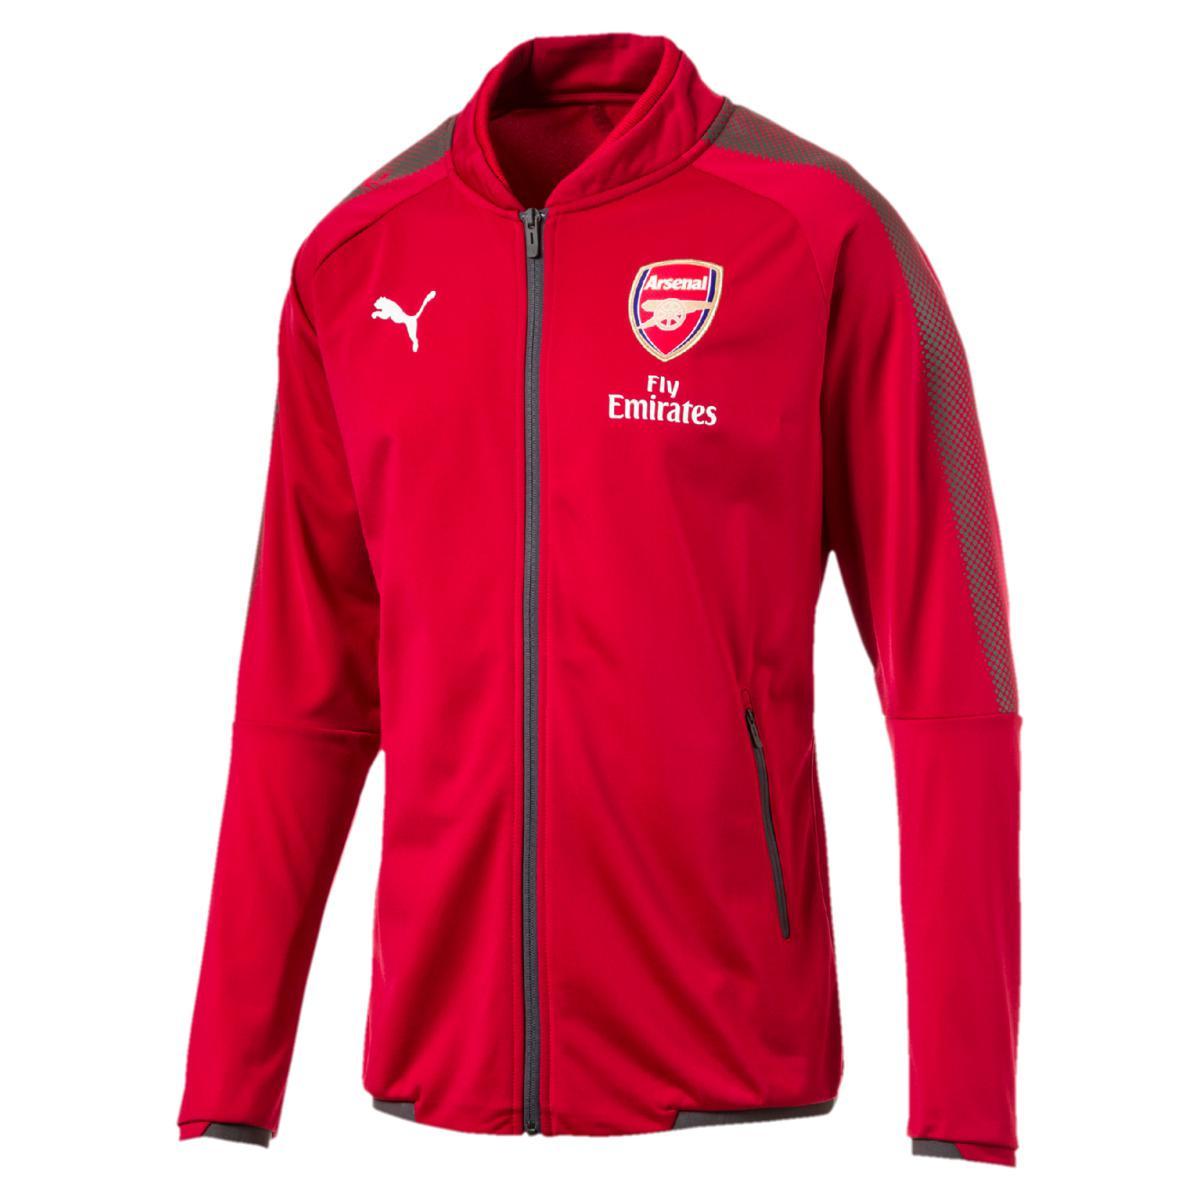 PUMA. Men's Red Arsenal Fc 2017-2018 Stadium Sweatshirt